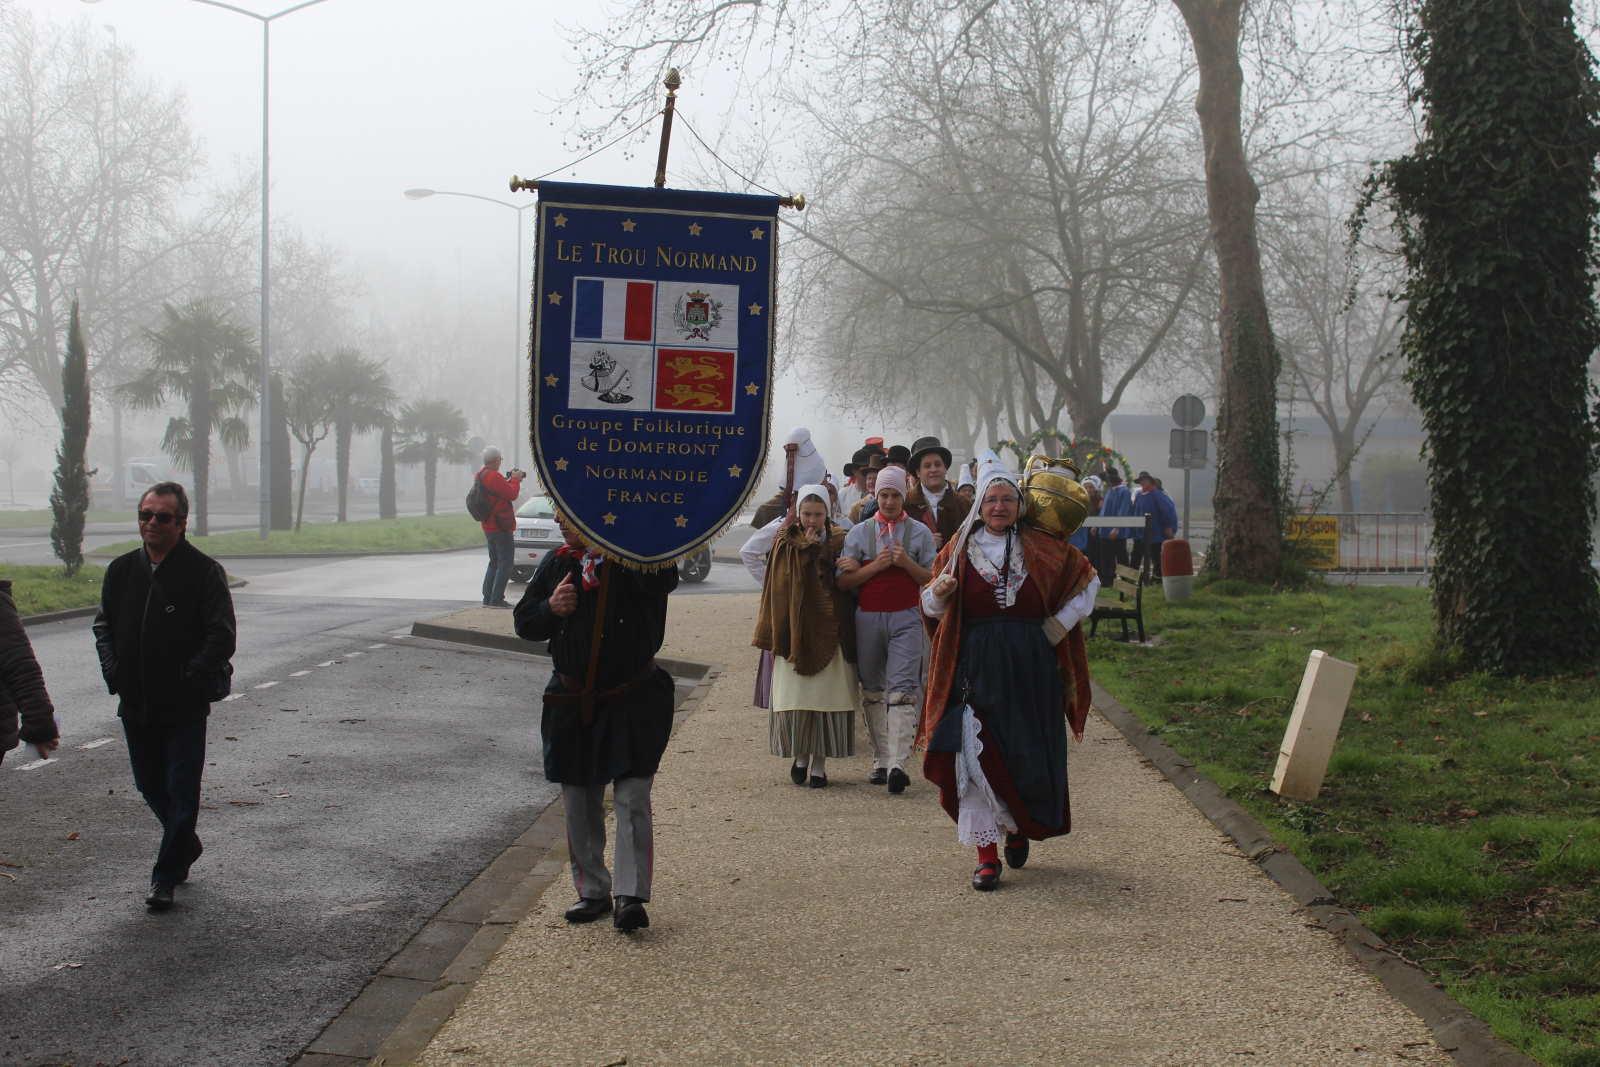 Festifolk Saintes Trou Normand 8